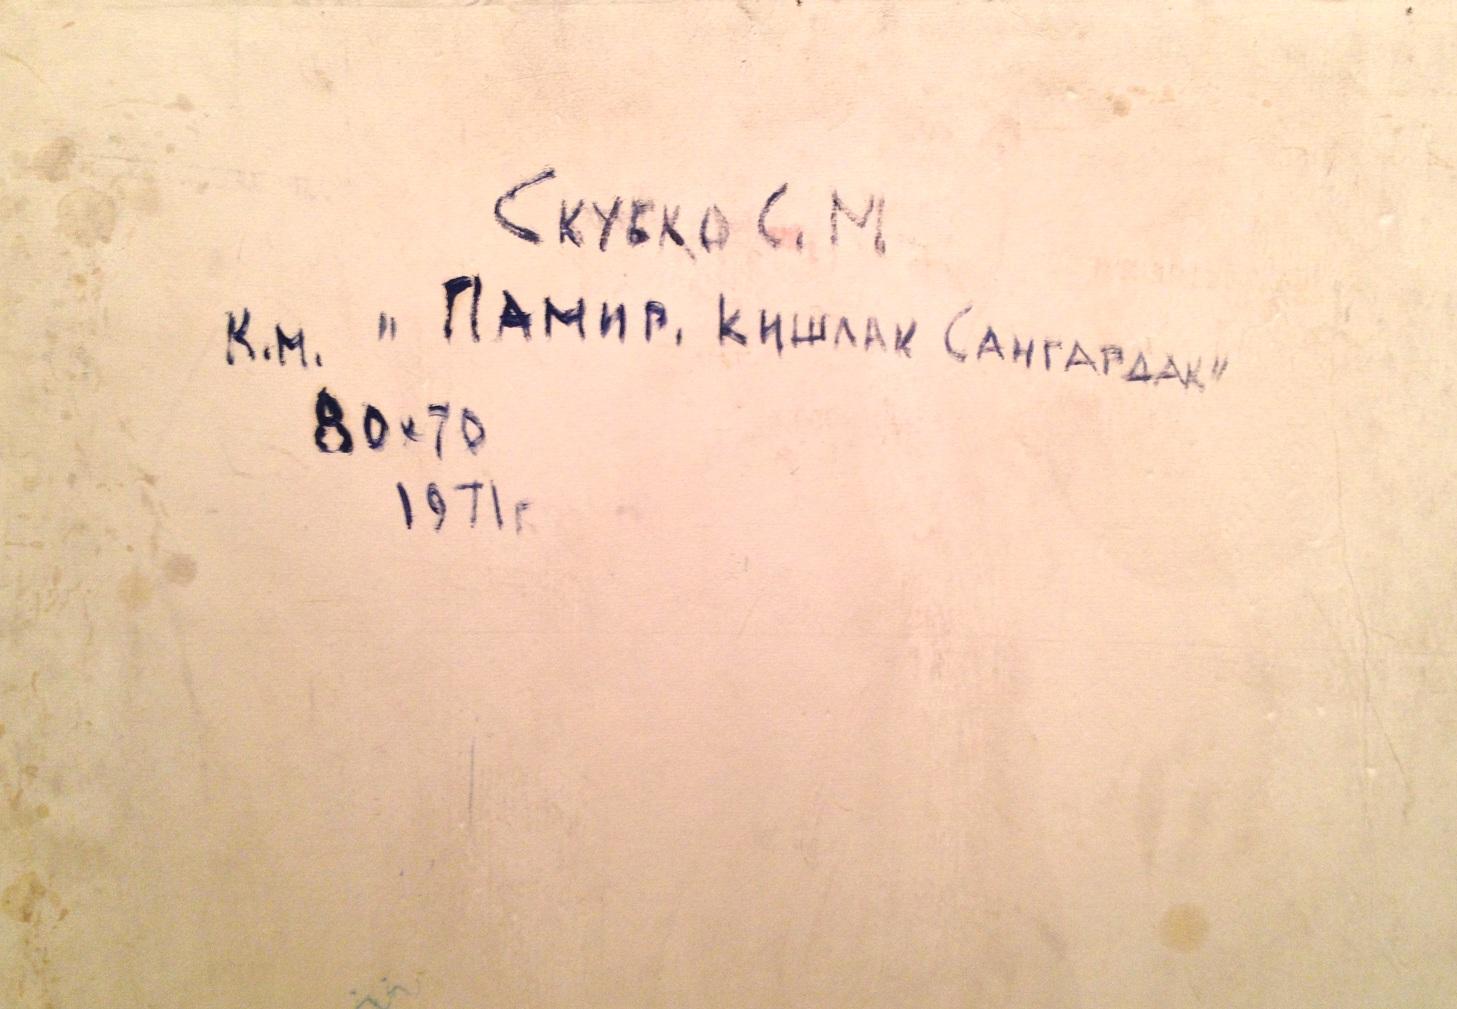 Оборот. Скубко Сергей Михайлович. Памир. Кишлак Сангардак.